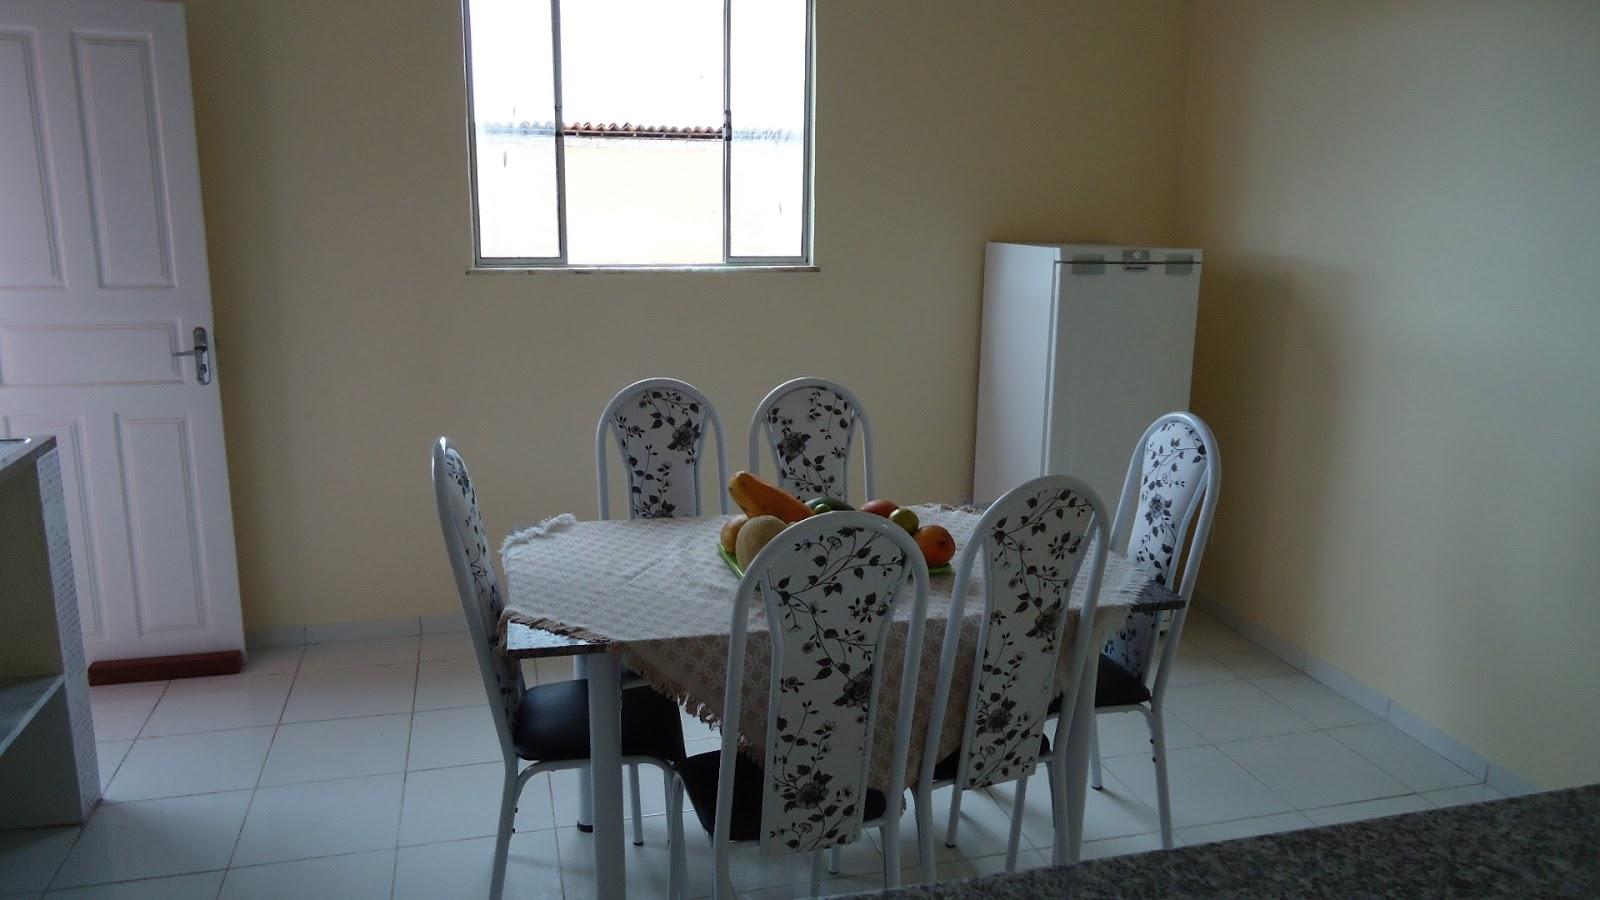 Outra foto da cozinha do pensionato (Fortaleza-CE)